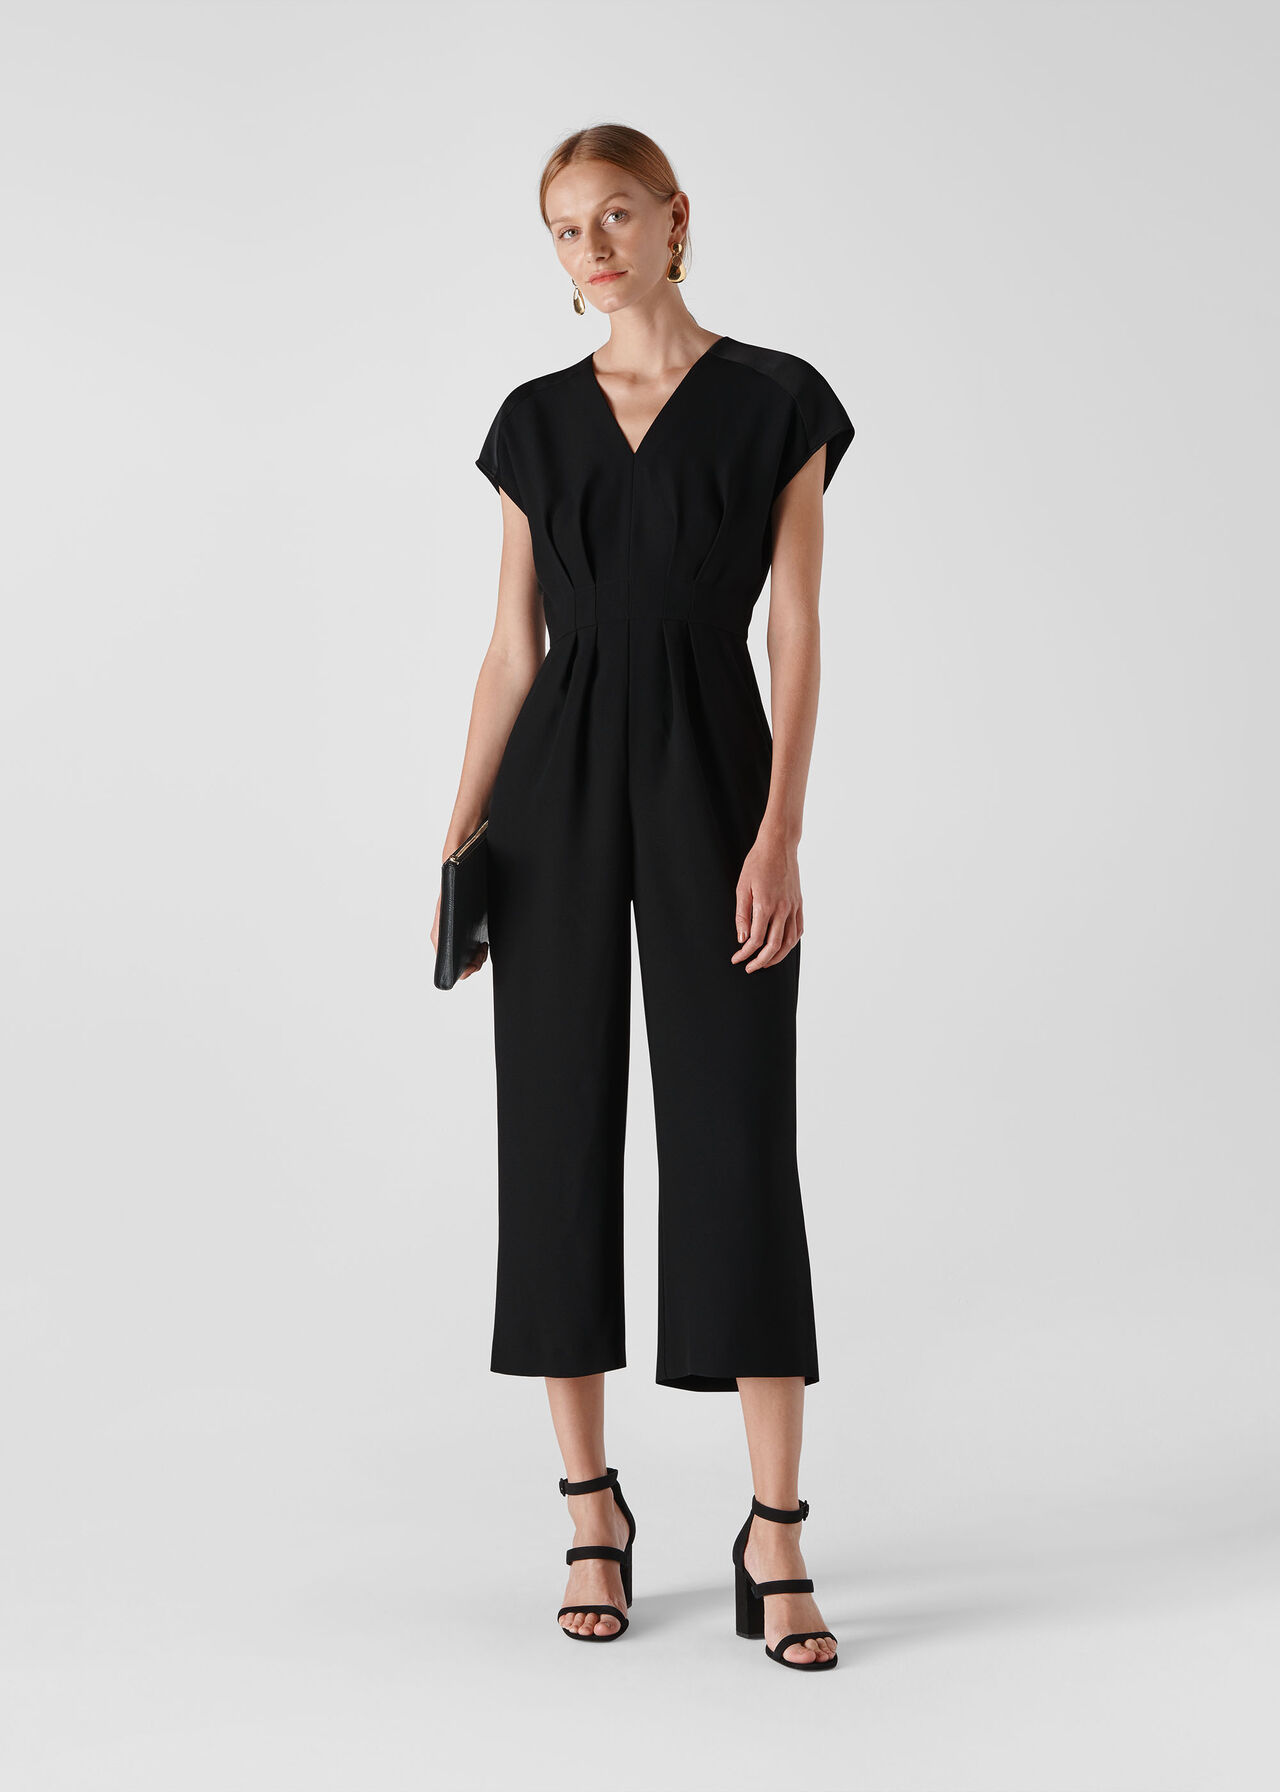 Mia Satin Mix Jumpsuit Black